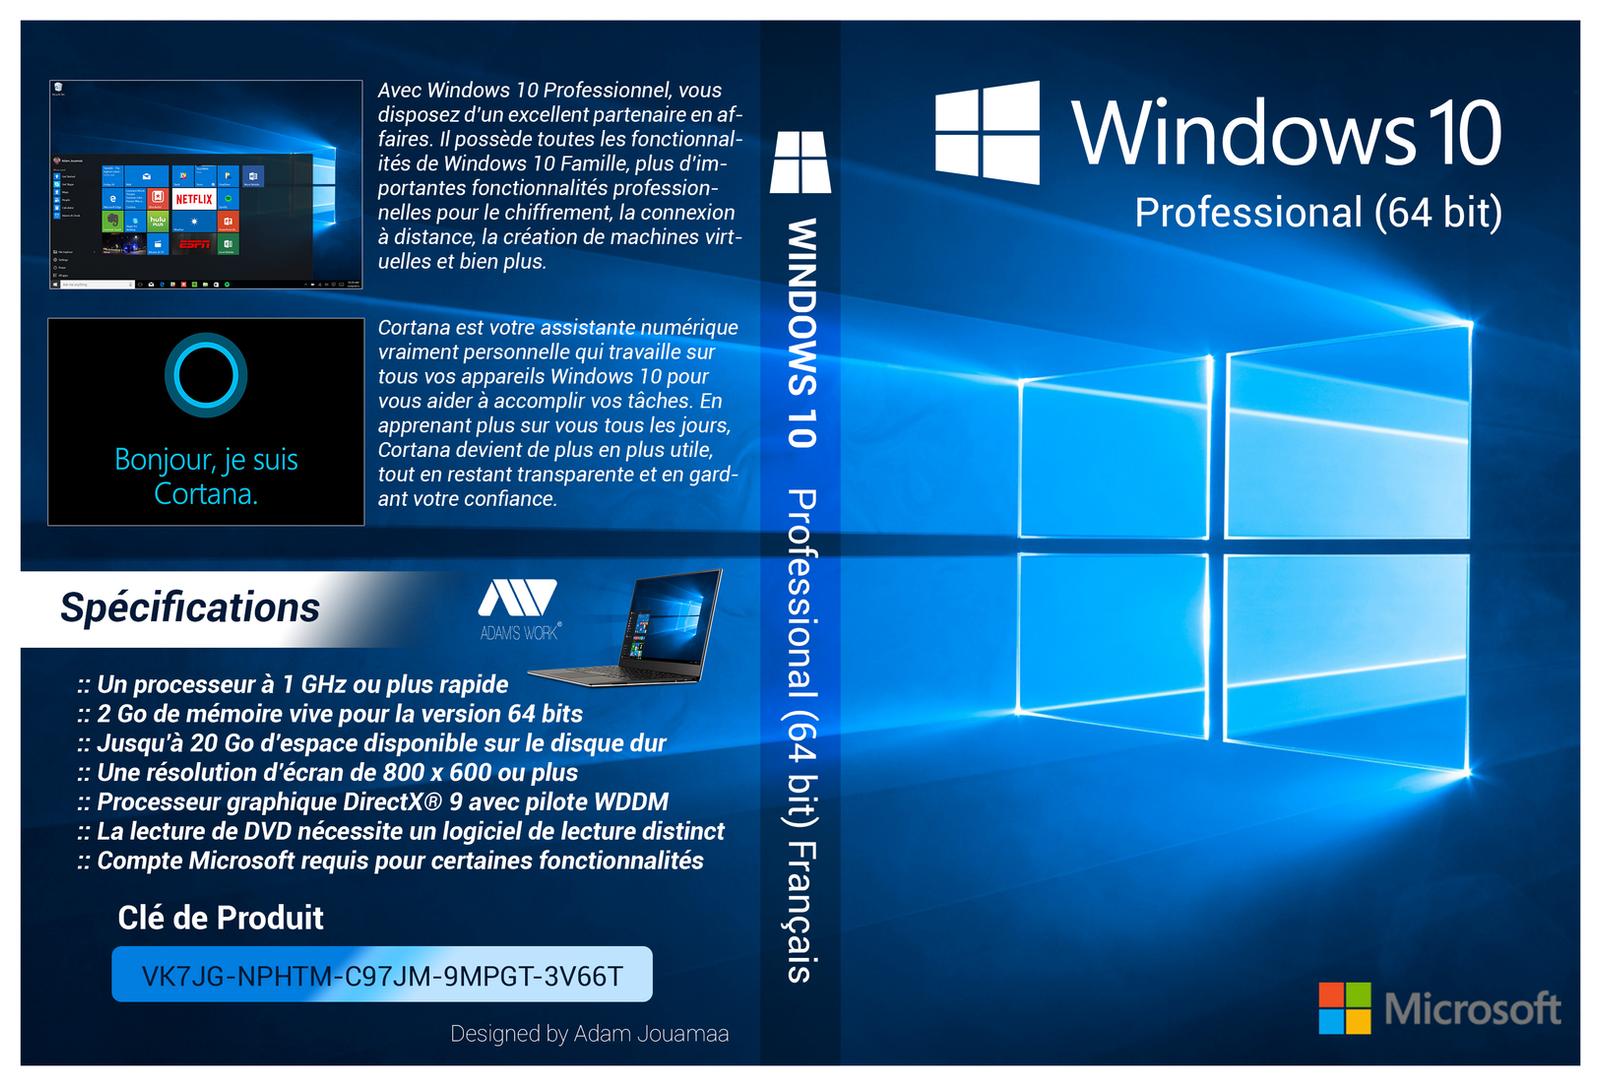 windows 10 pro download iso 64 bit full version